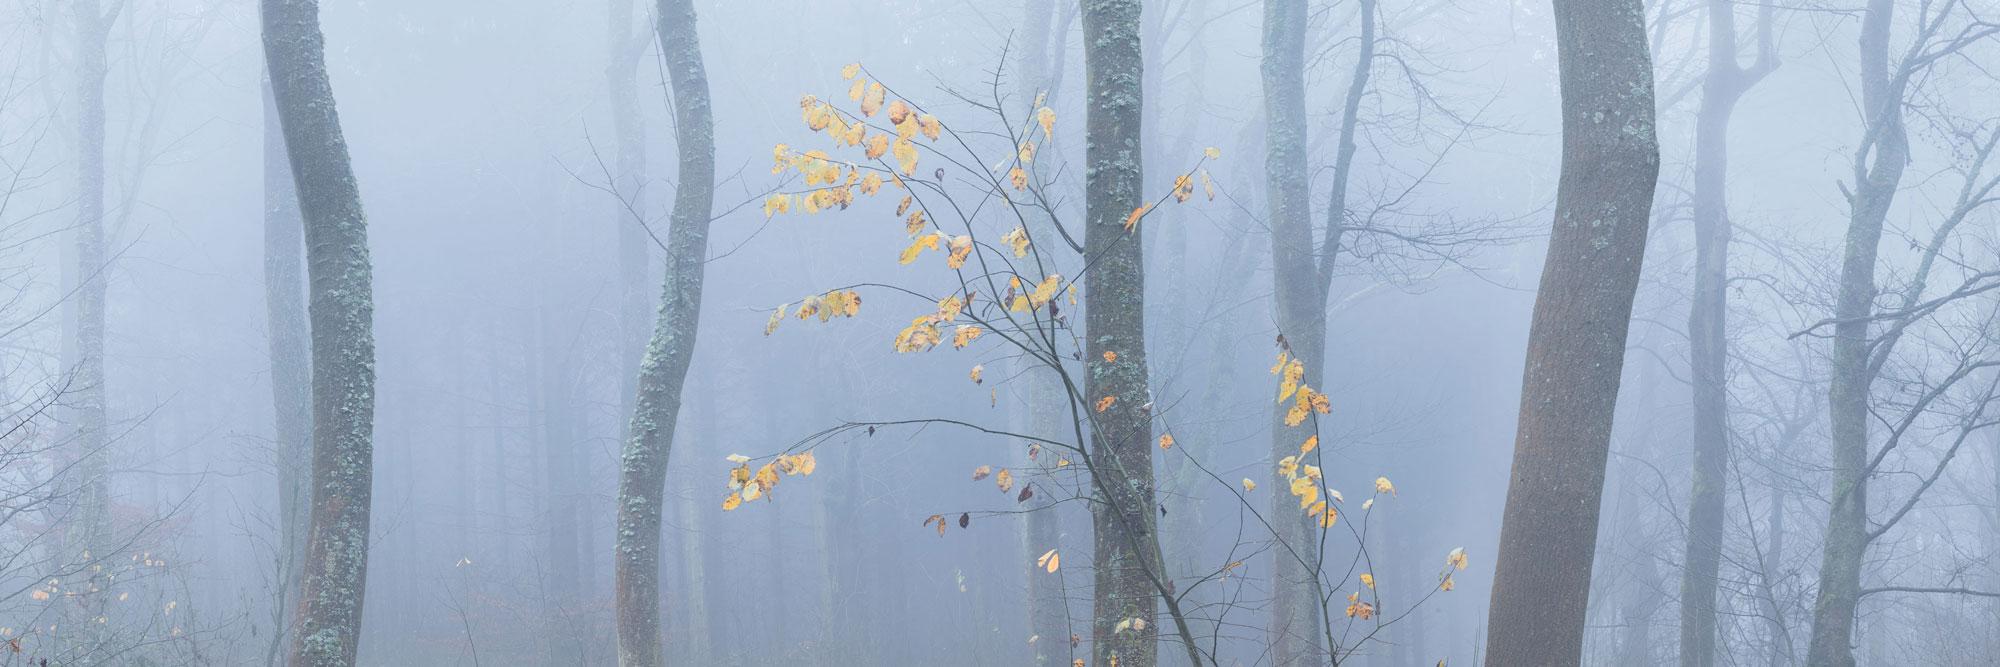 panoramac print of English woodland in autumn